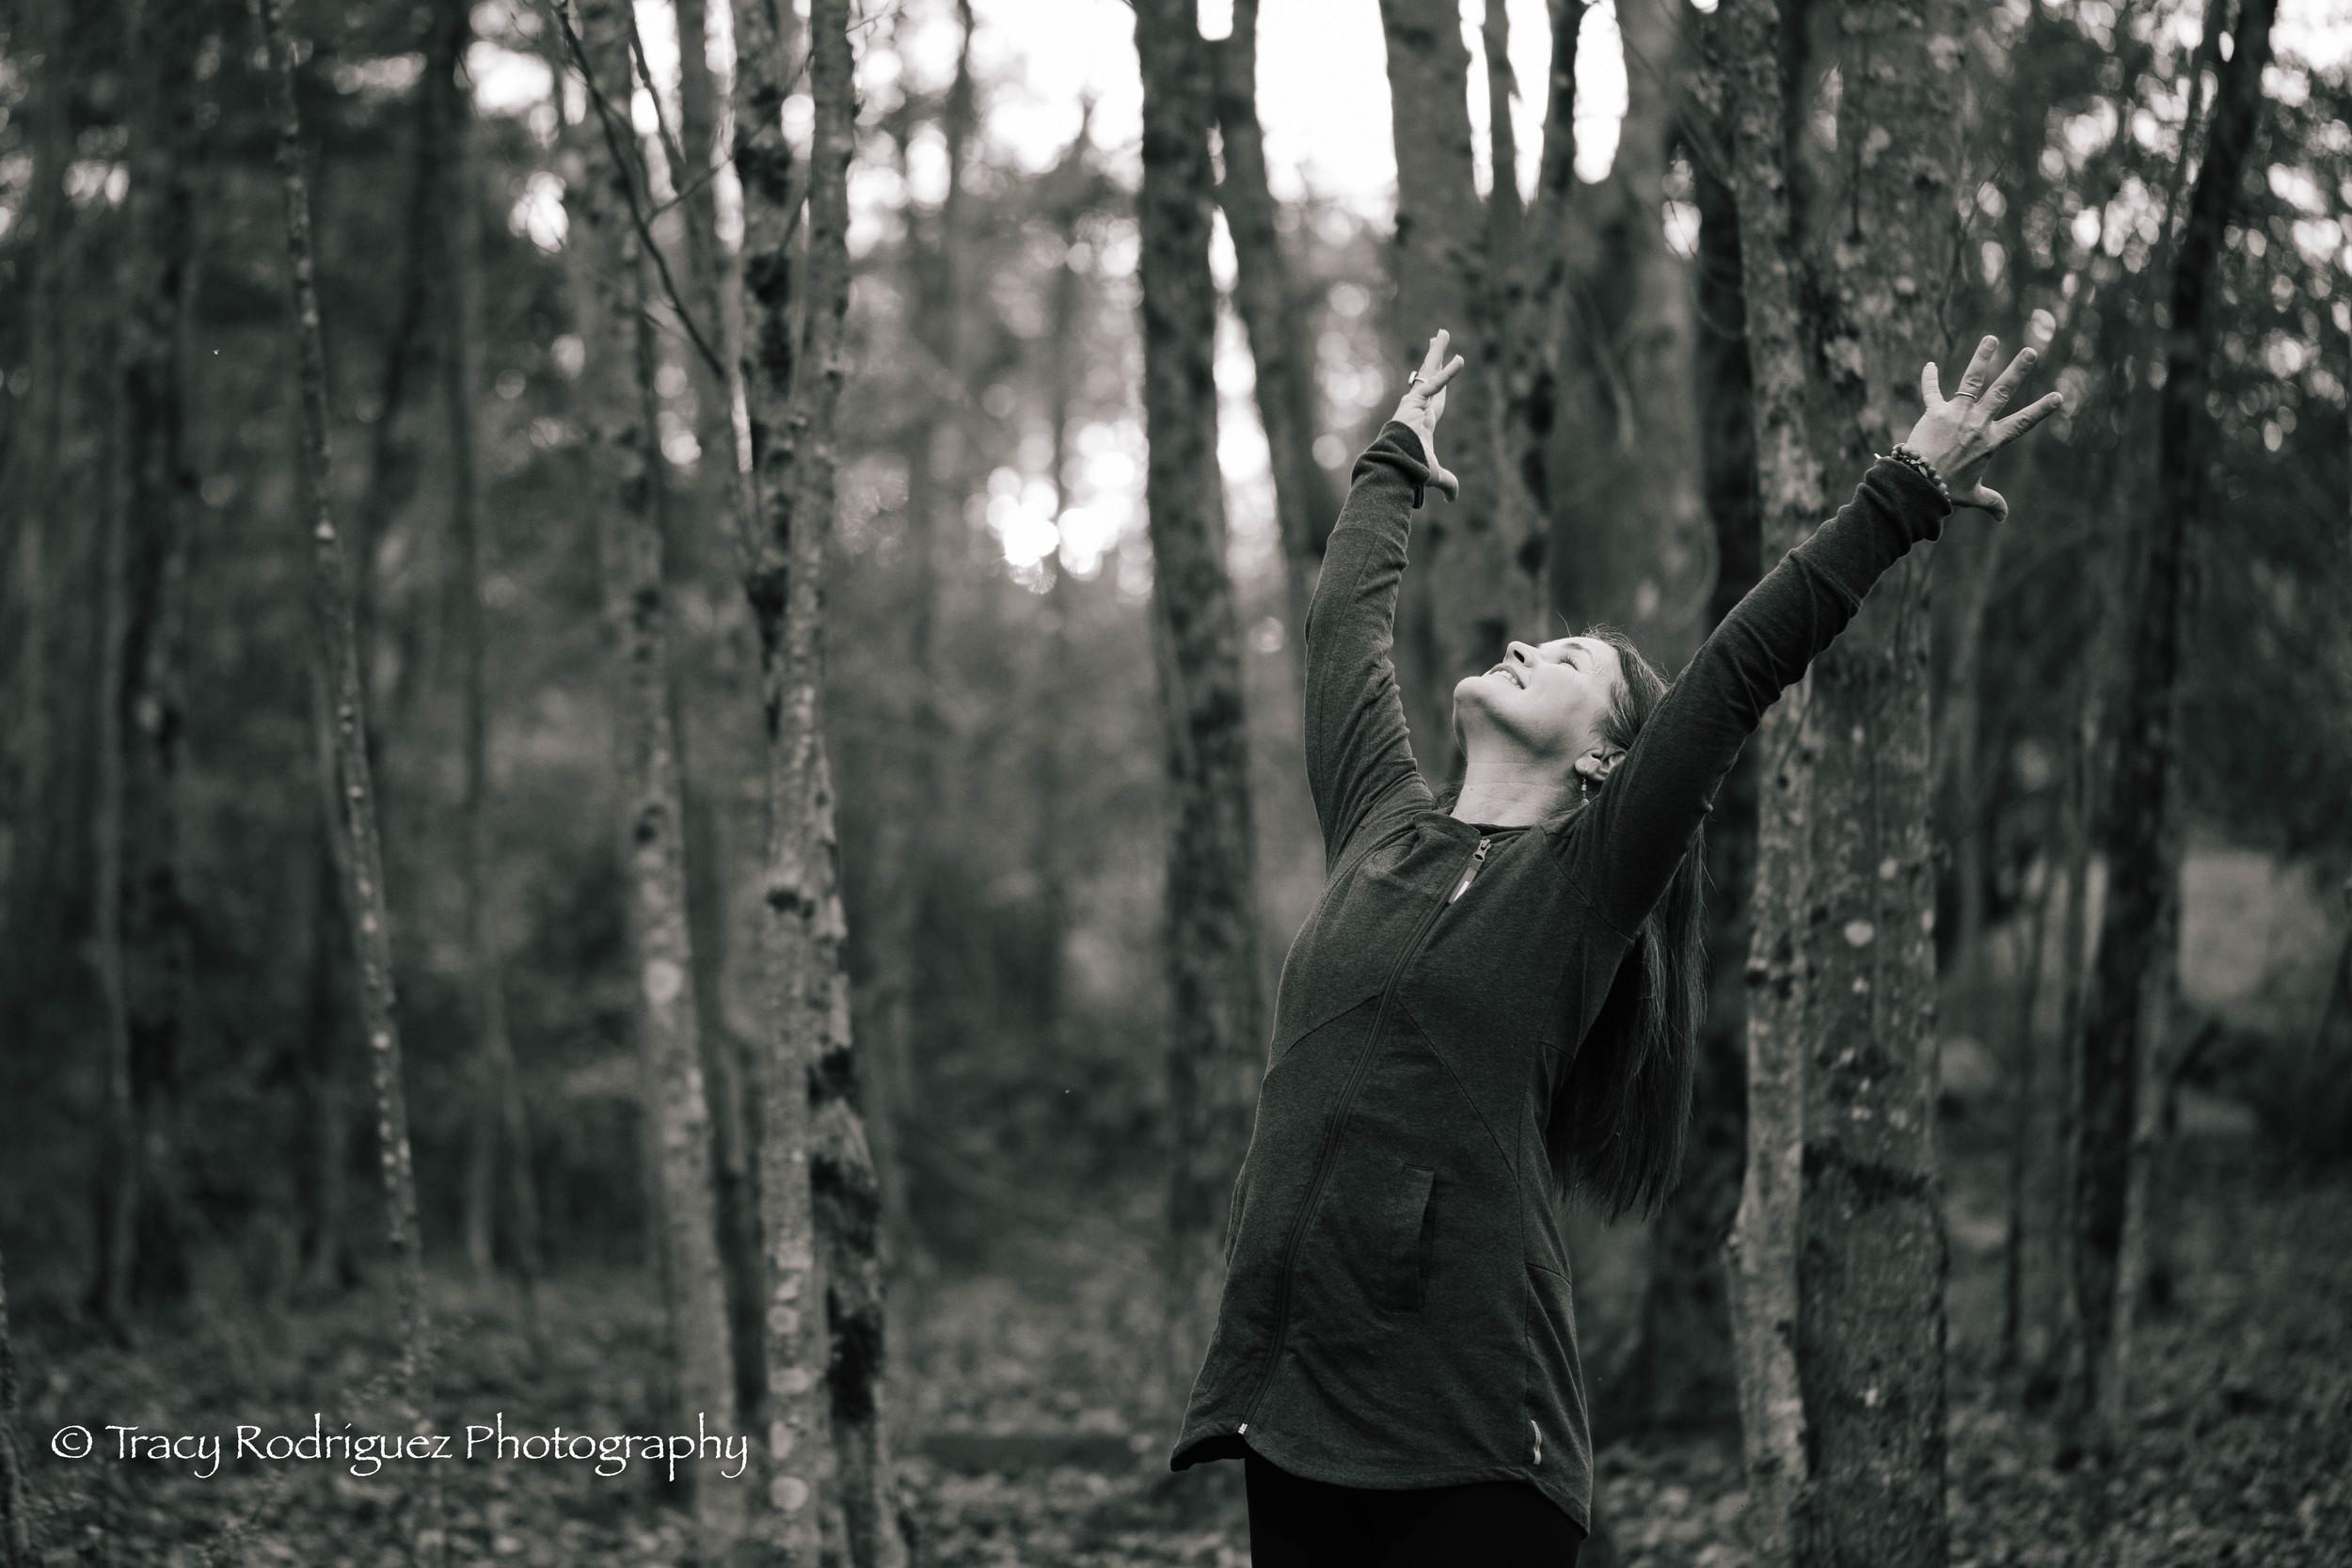 TracyRodriguezPhotography-3.jpg